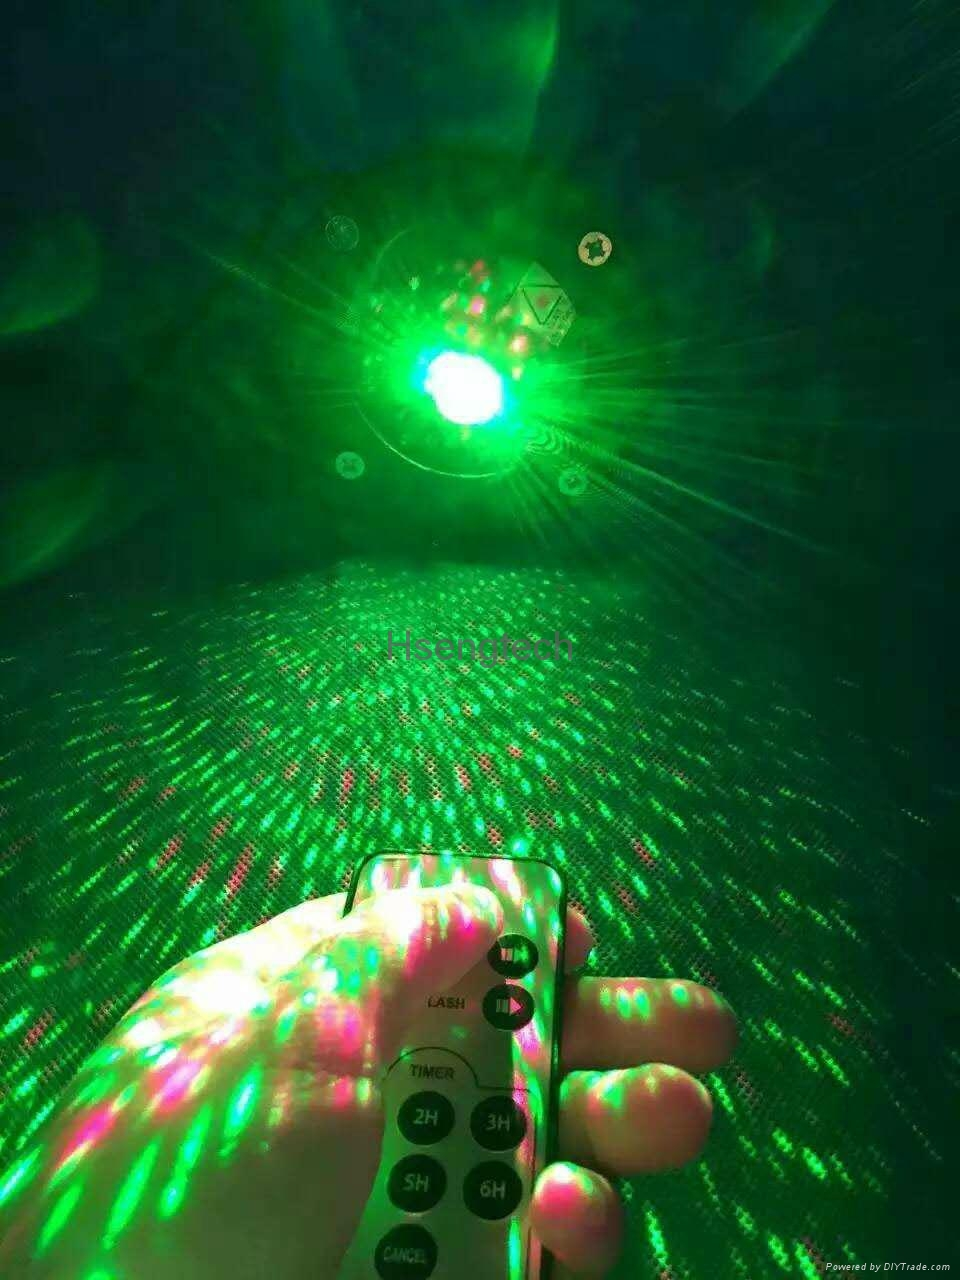 Waterproof Laser Stage Lights Red Green Projector Garden Lawn Lamps Outdoor 5